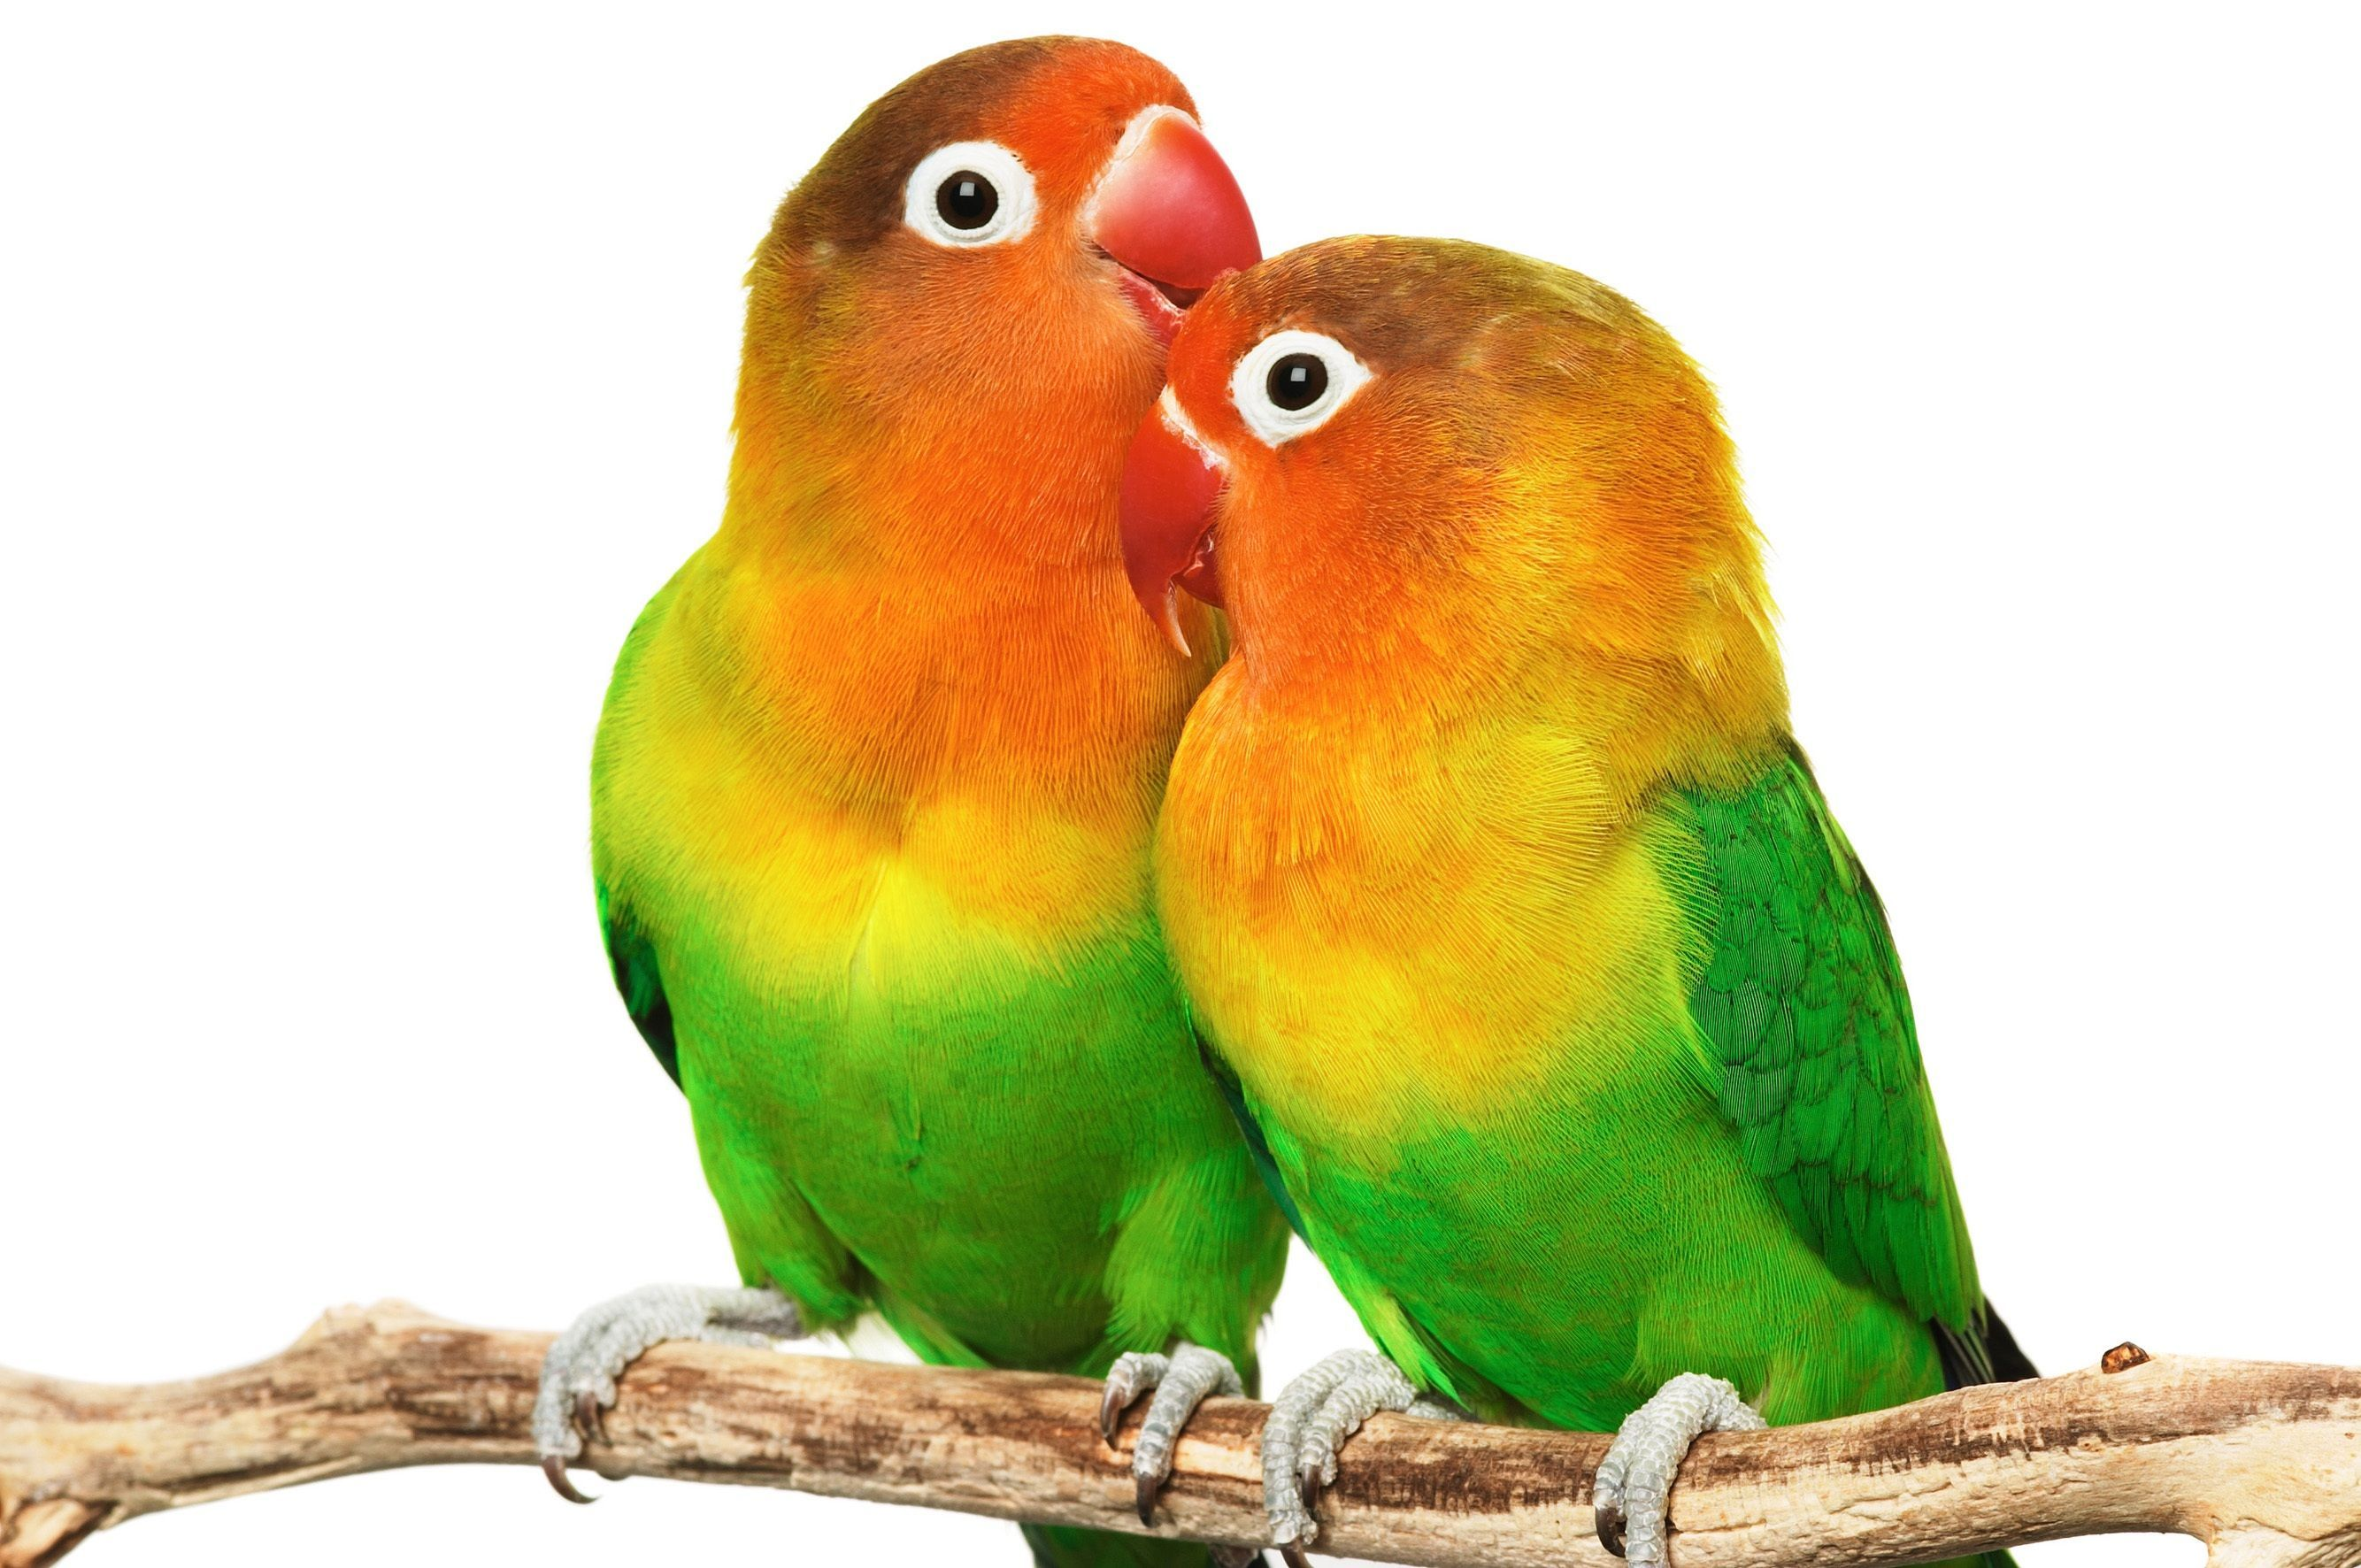 Love Birds Wallpapers On Wallpaperdog